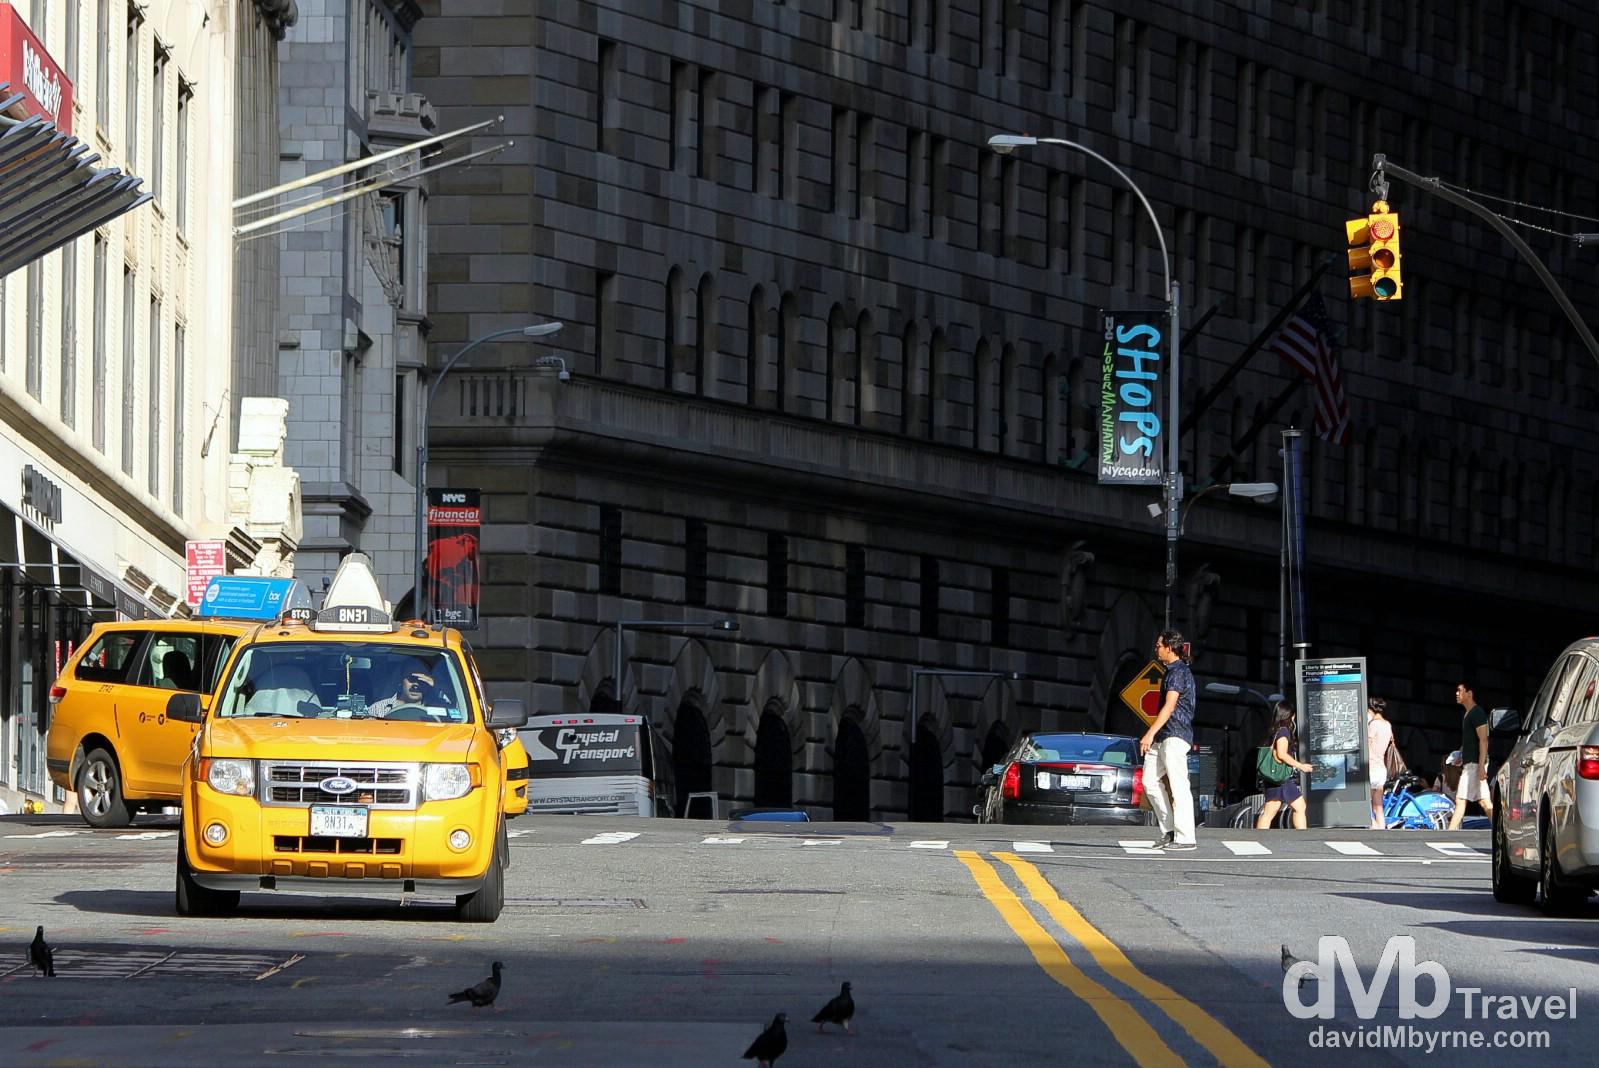 Lower Manhattan, New York. July 14th 2013.